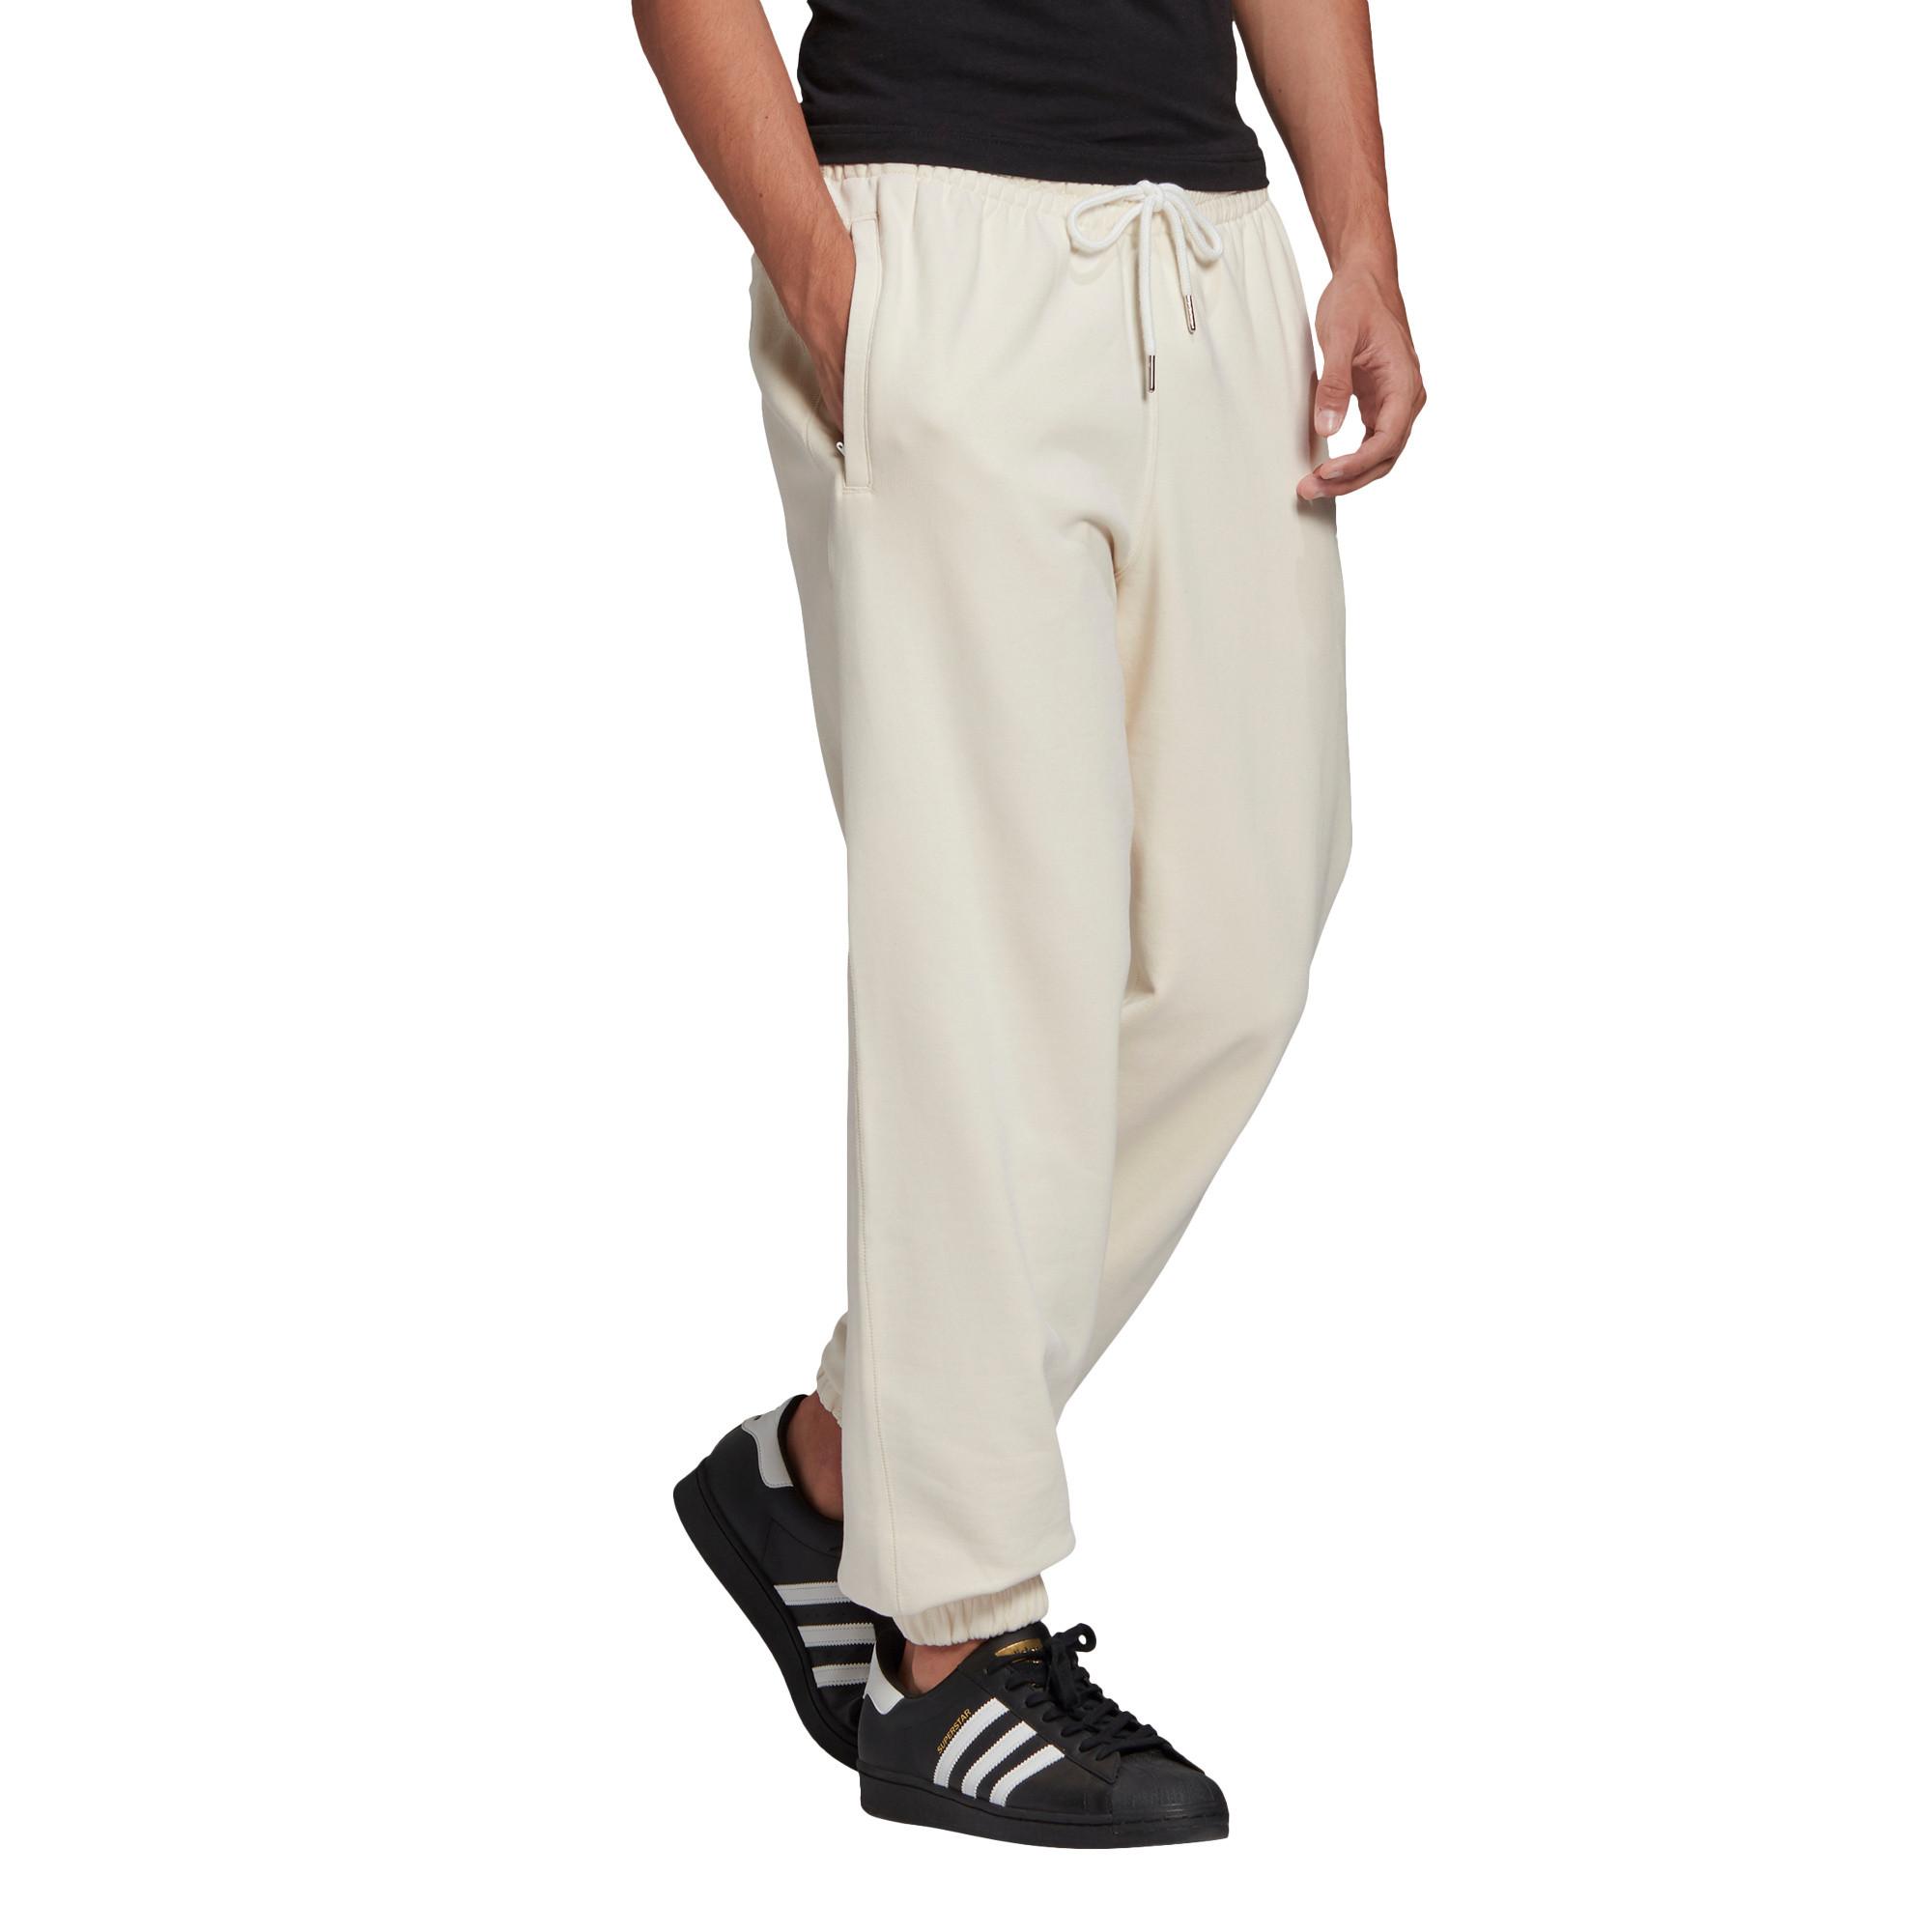 Pantaloni tuta adicolor Premium, Bianco panna, large image number 1